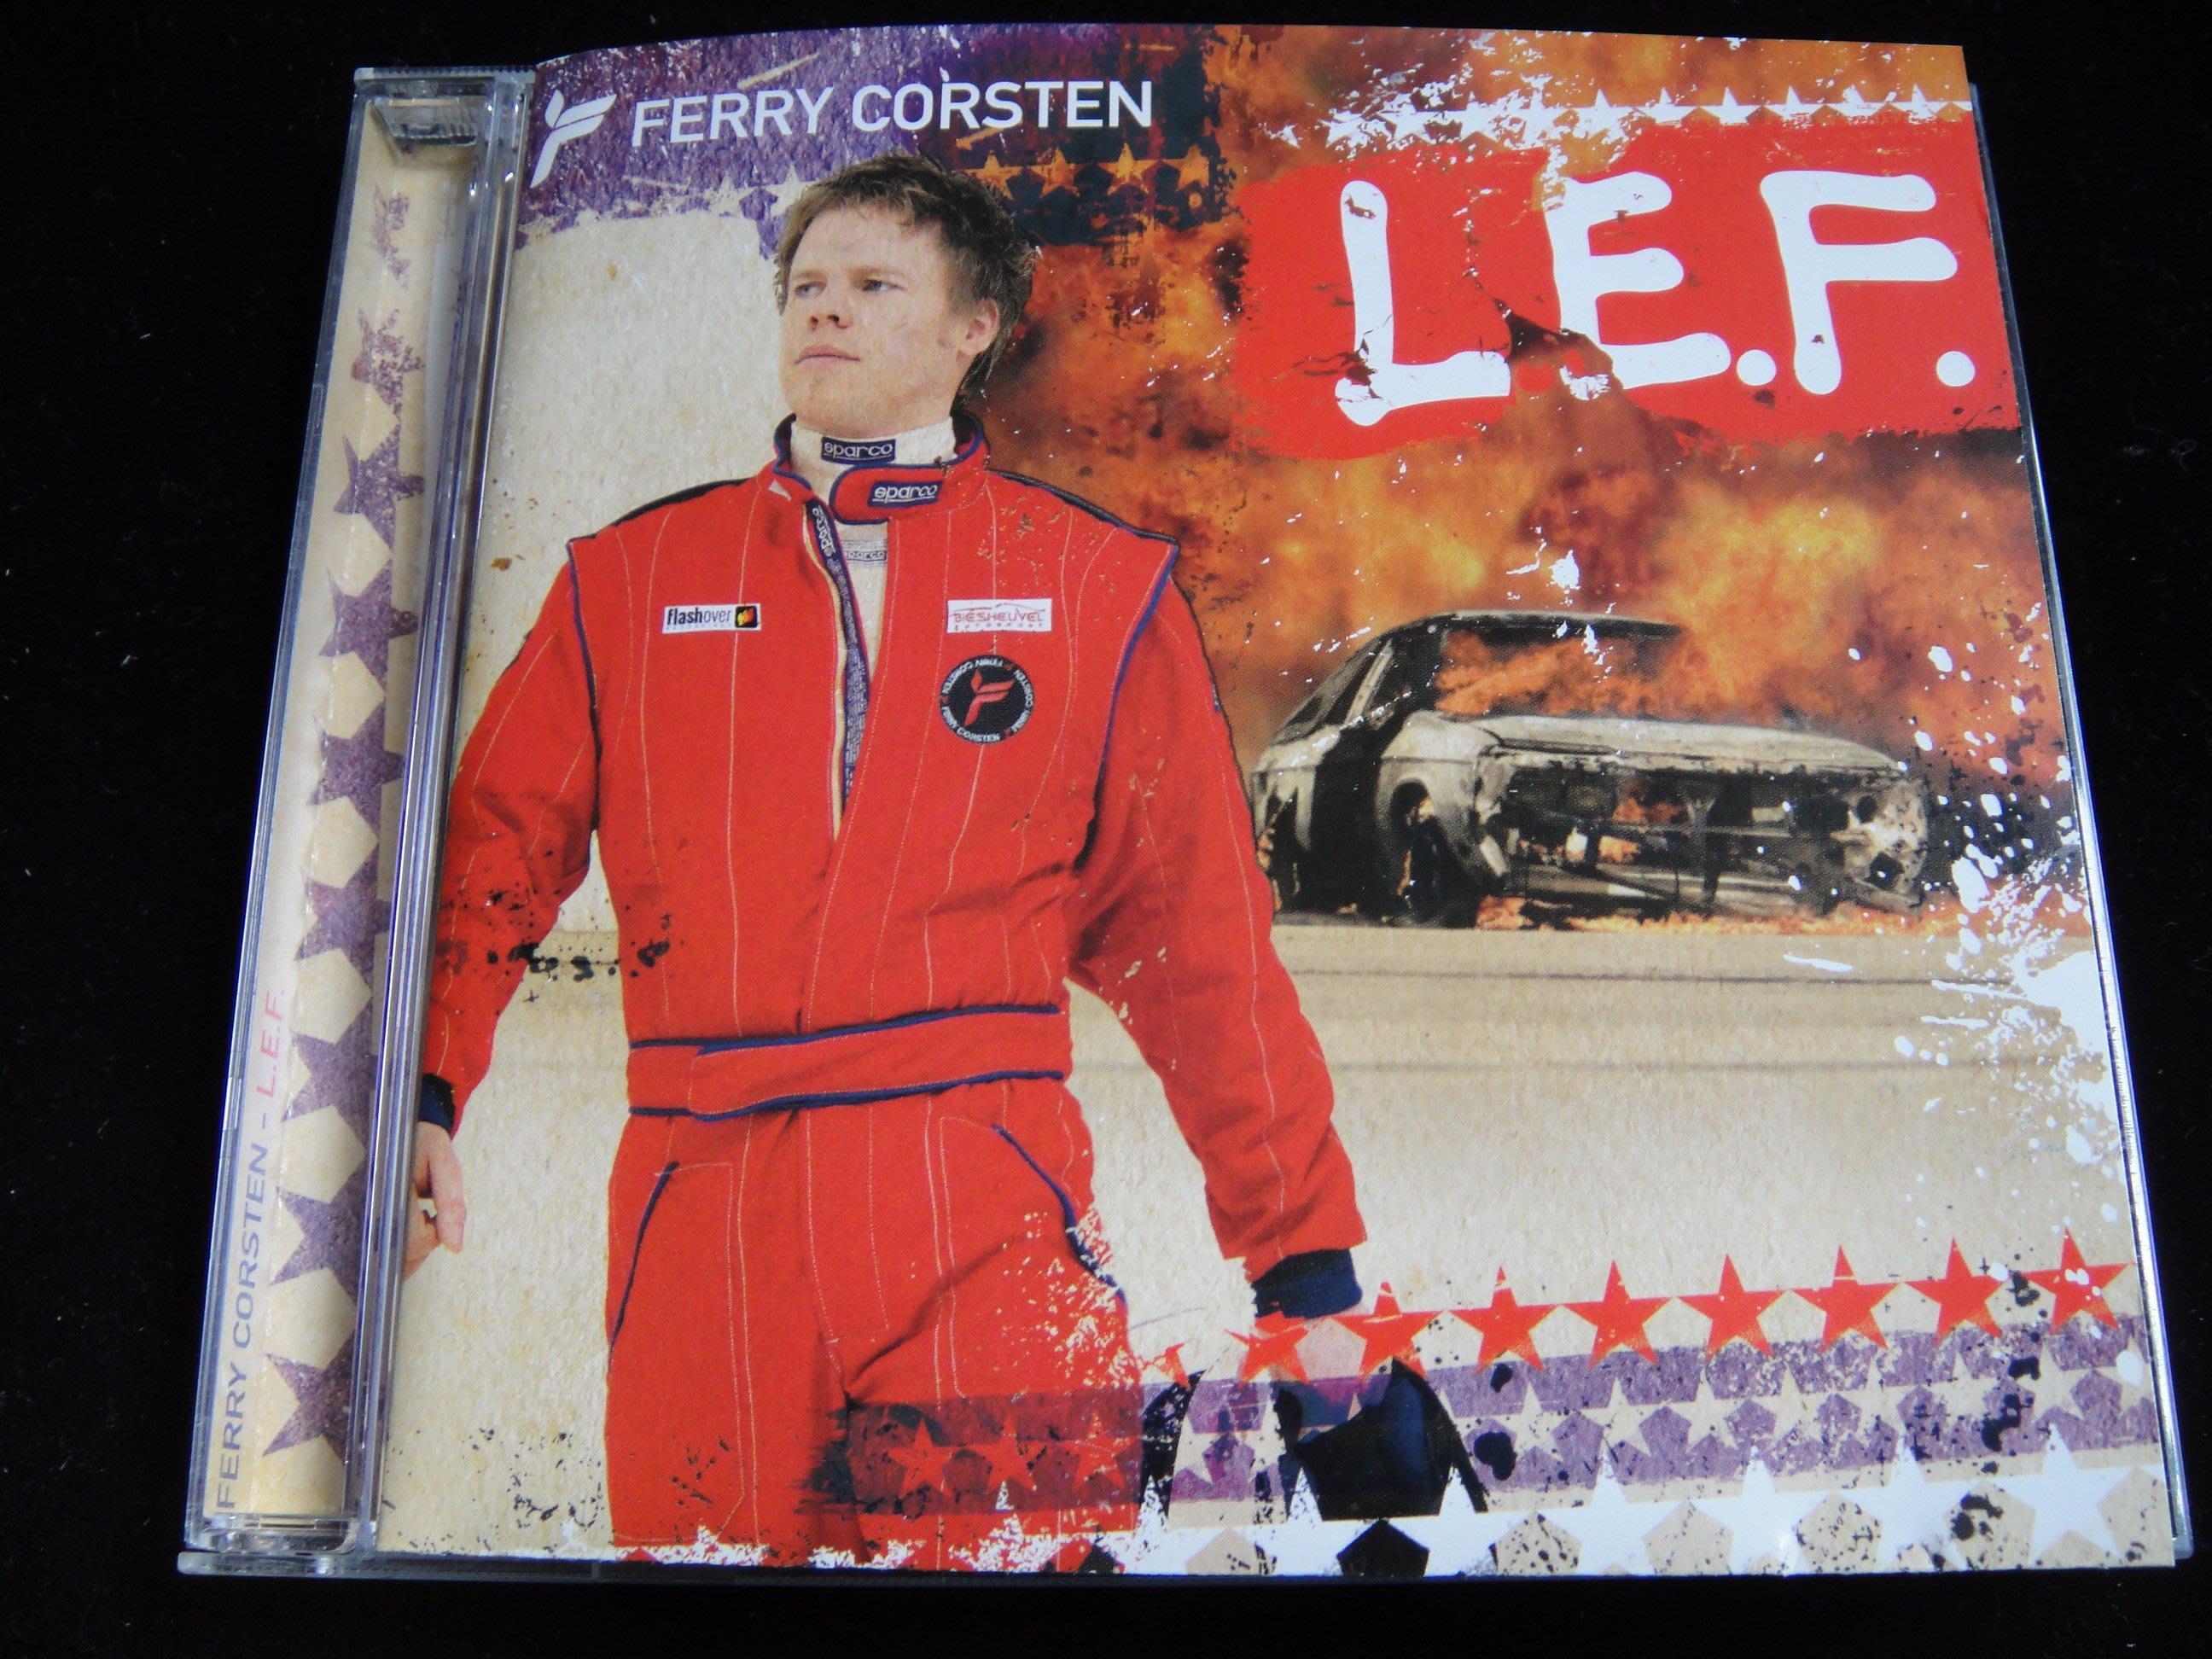 【198樂坊】 Ferry Corsten L.E.F費利高士頓(Are You Ready.....台版)DF